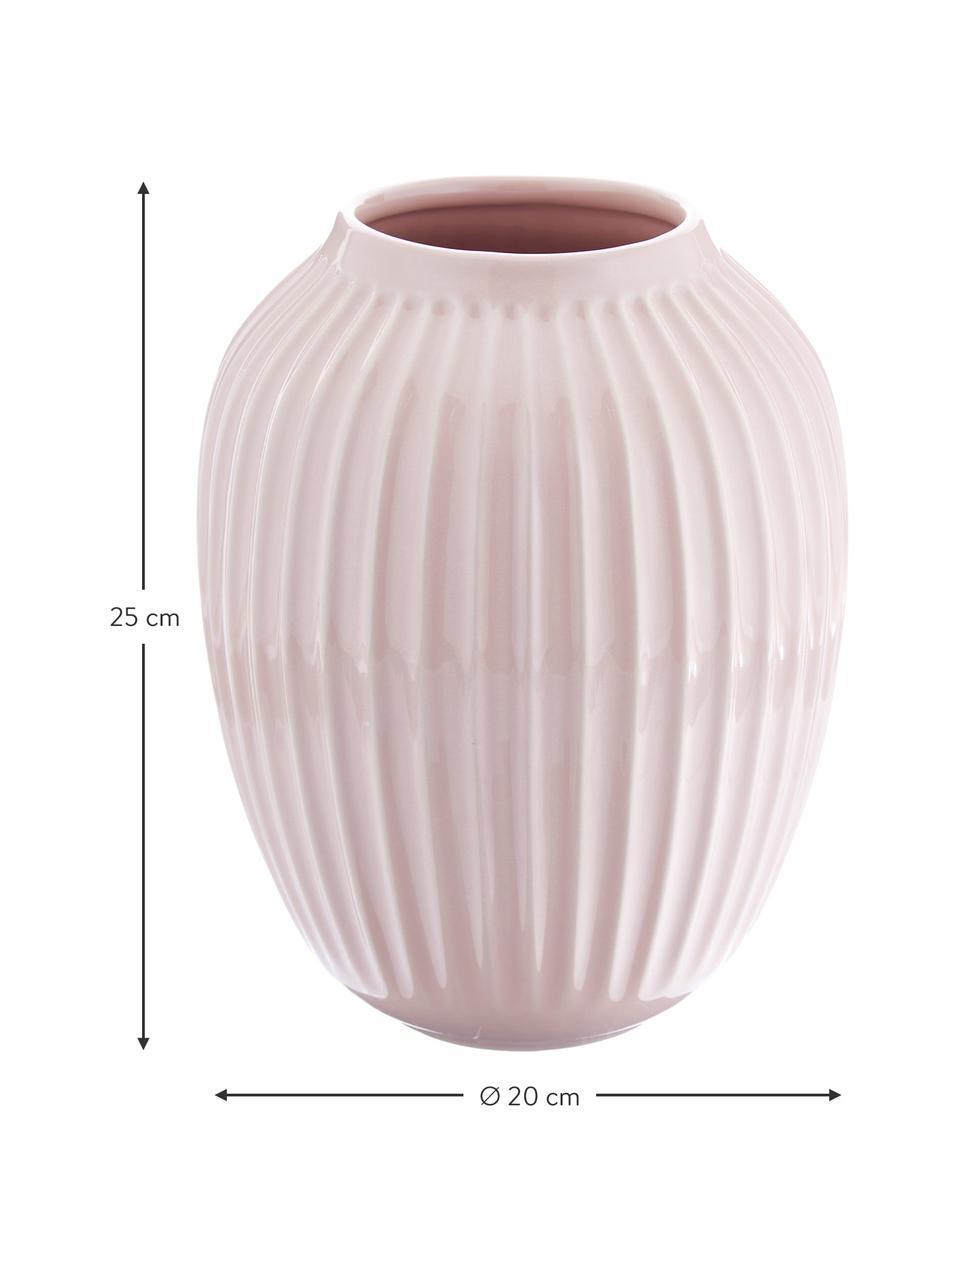 Handgemaakte design vaas Hammershøi, Porselein, Roze, Ø 20 x H 25 cm